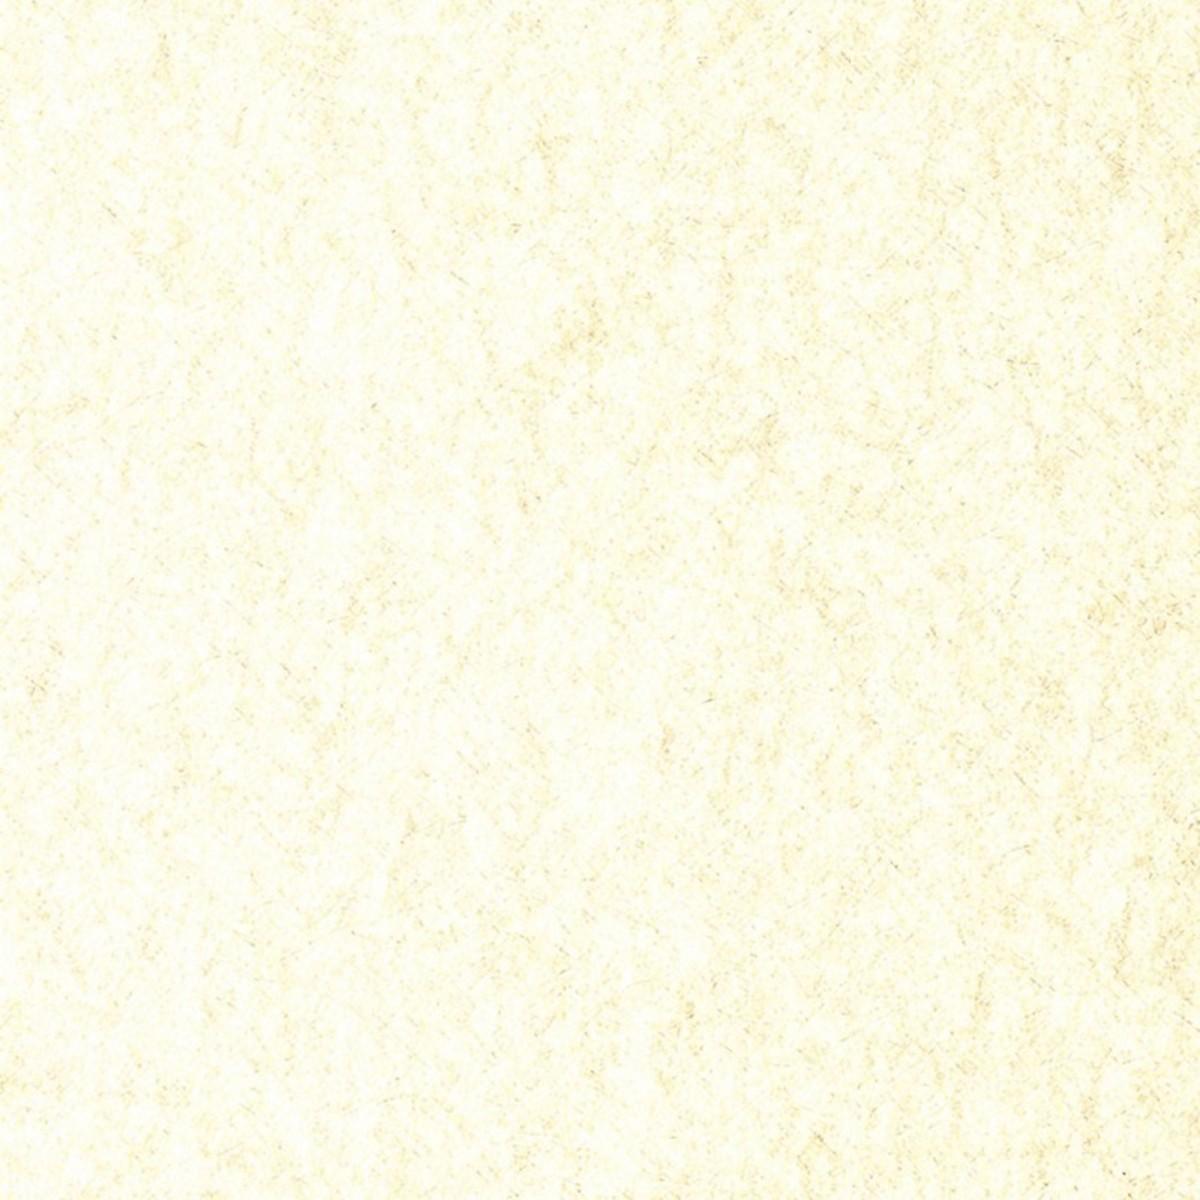 Виниловые обои York Wallcoverings бежевые NB780702 0.52 м